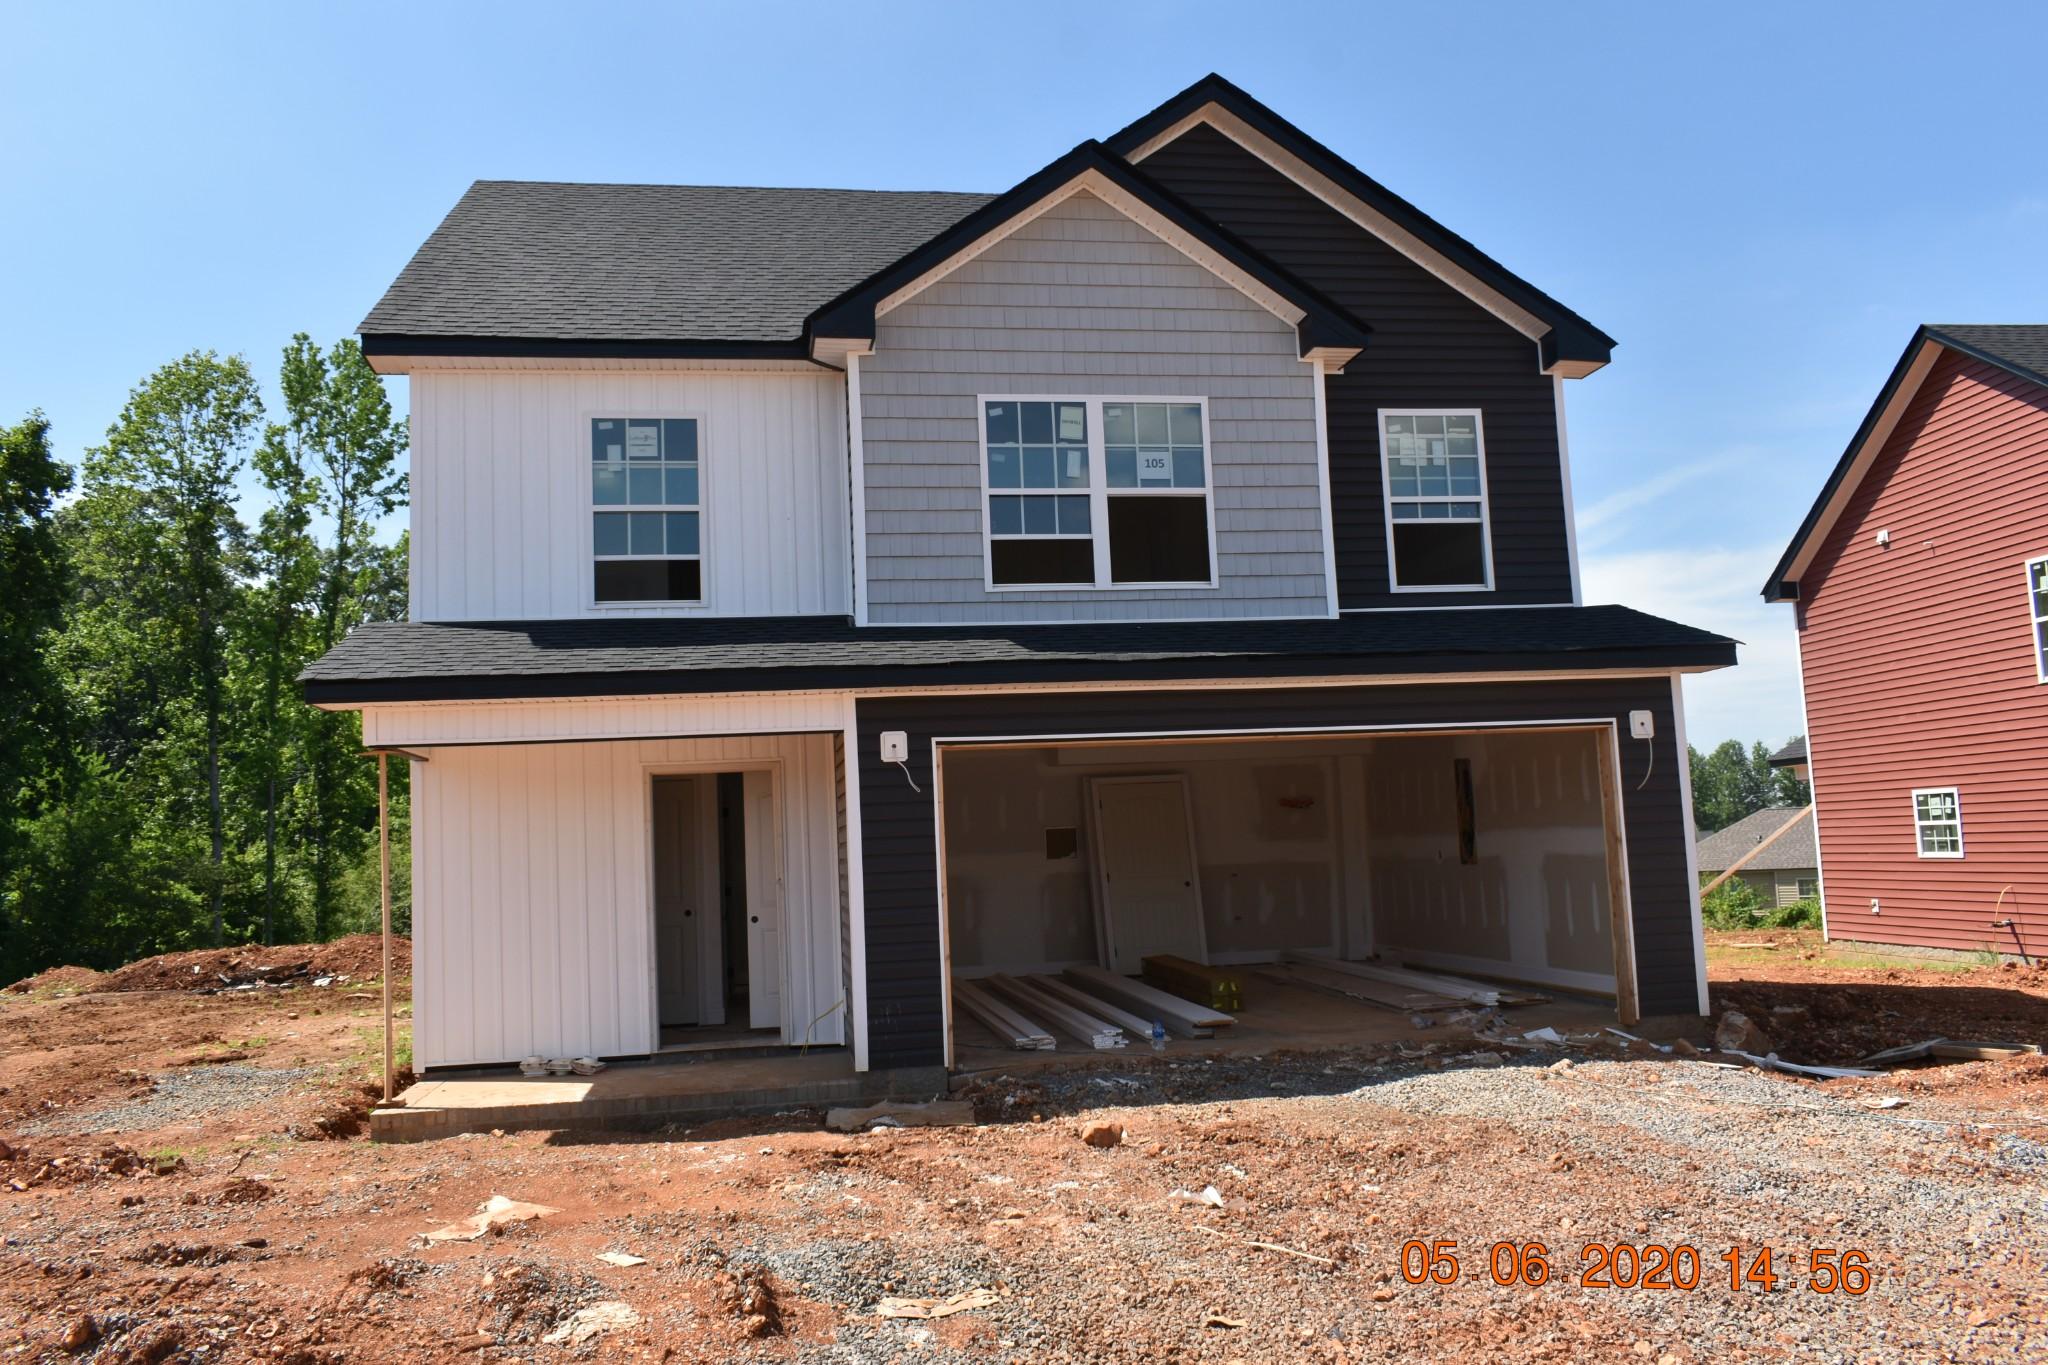 105 Chestnut Hill, Clarksville, TN 37042 - Clarksville, TN real estate listing